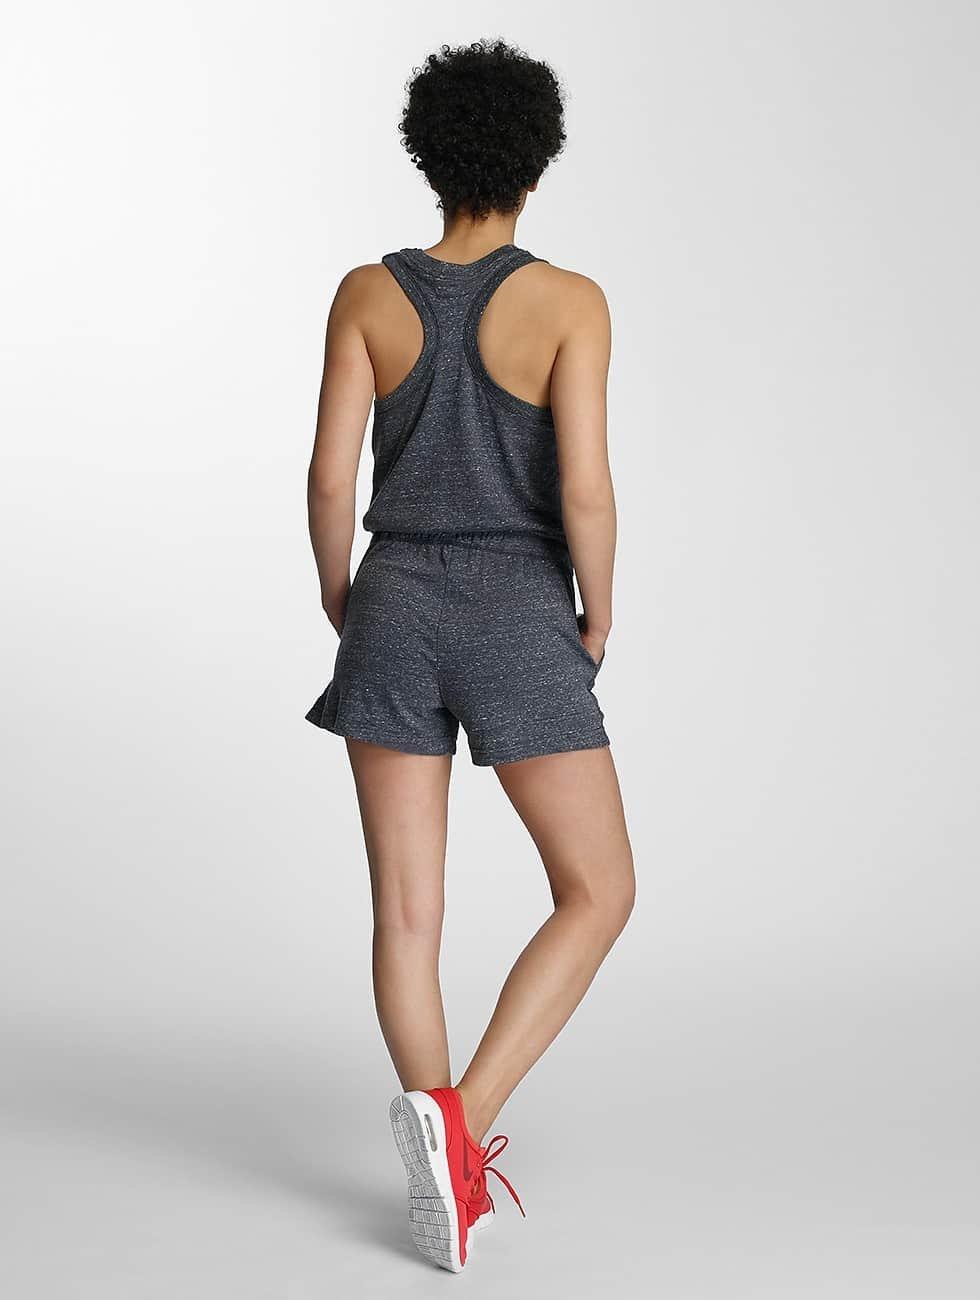 Nike Overály NSW Gym Vintage šedá